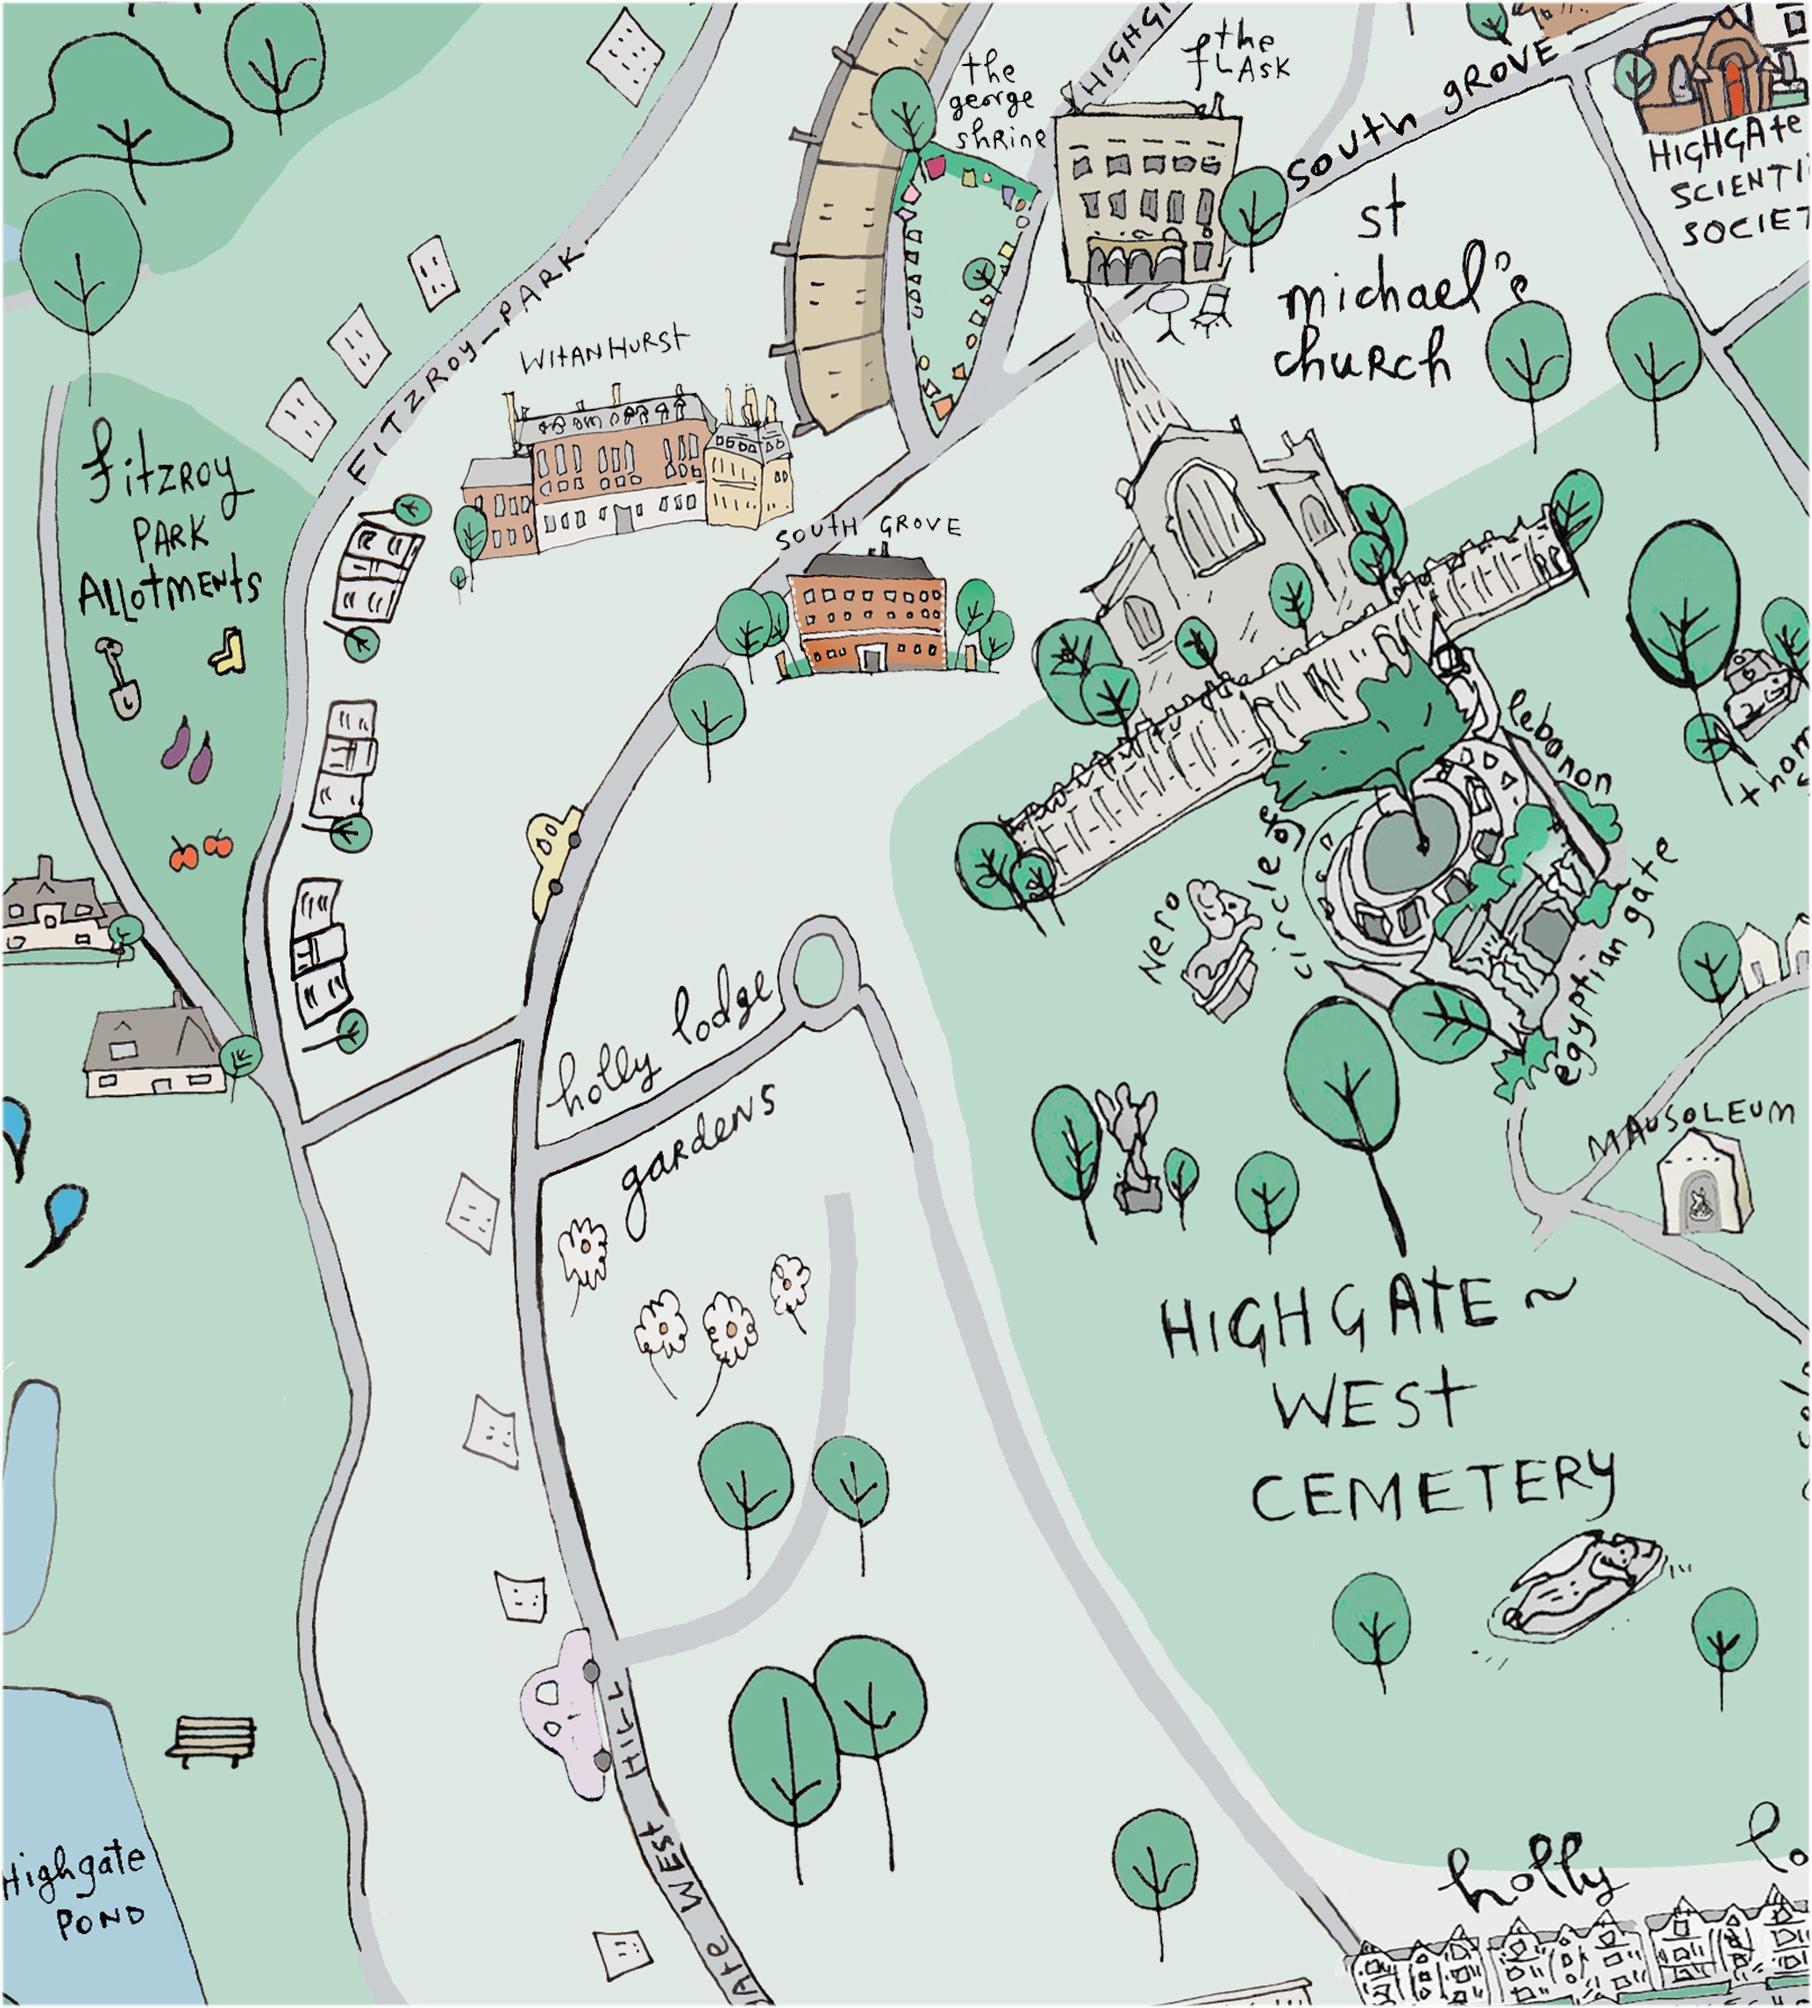 Highgate Cemetery Map Highgate and Hampstead Map – Raw Art Highgate Cemetery Map